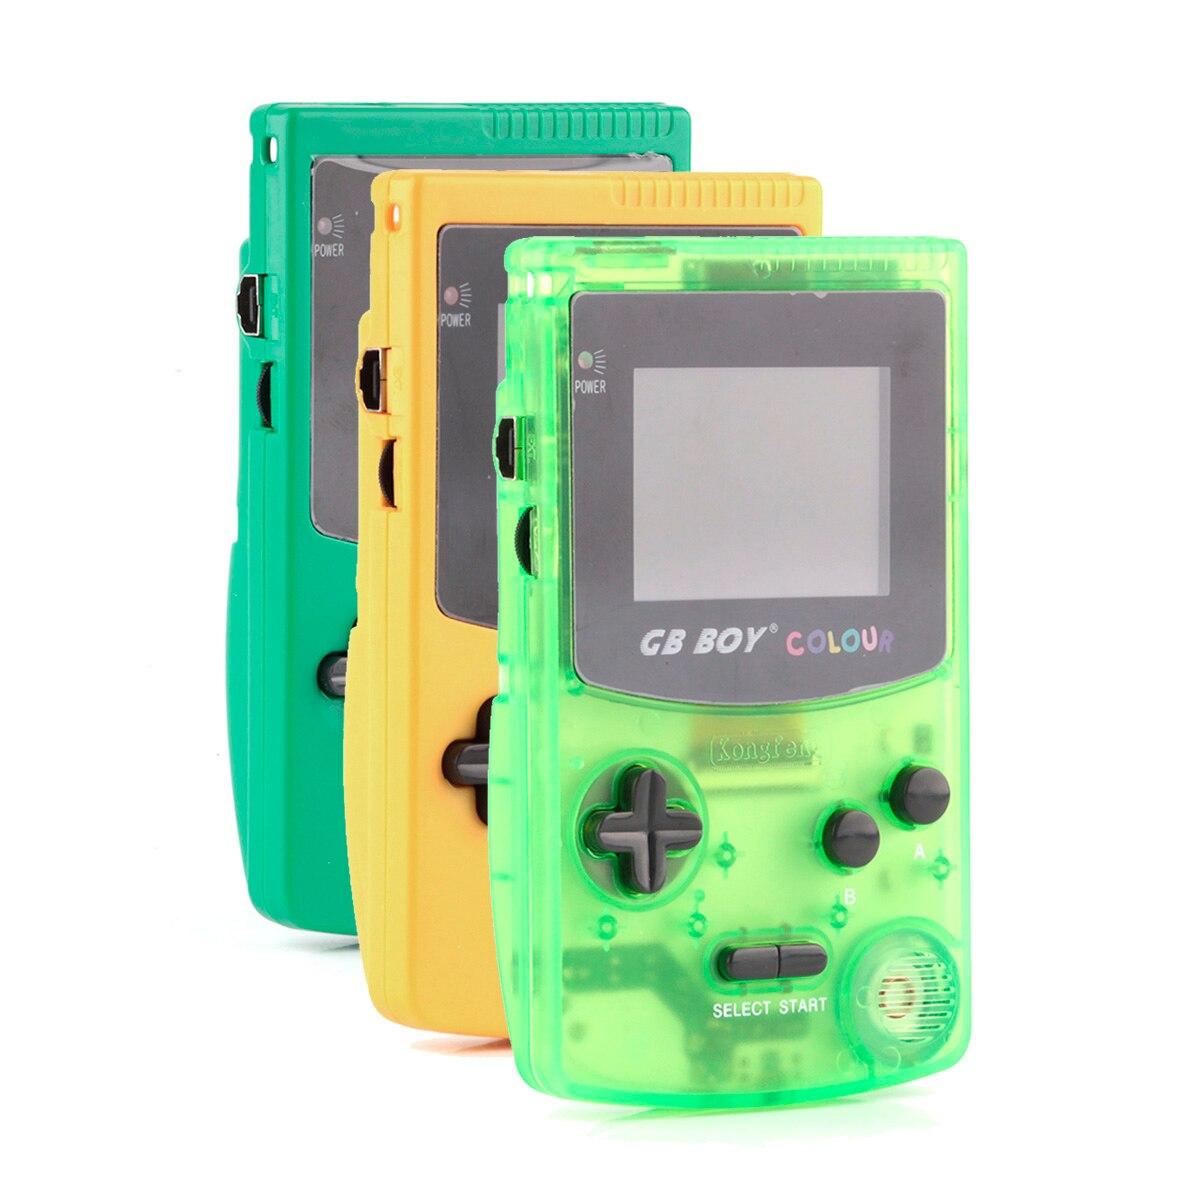 1 pçs/lote GB Menino Cor Cor Handheld Game Player 2.7